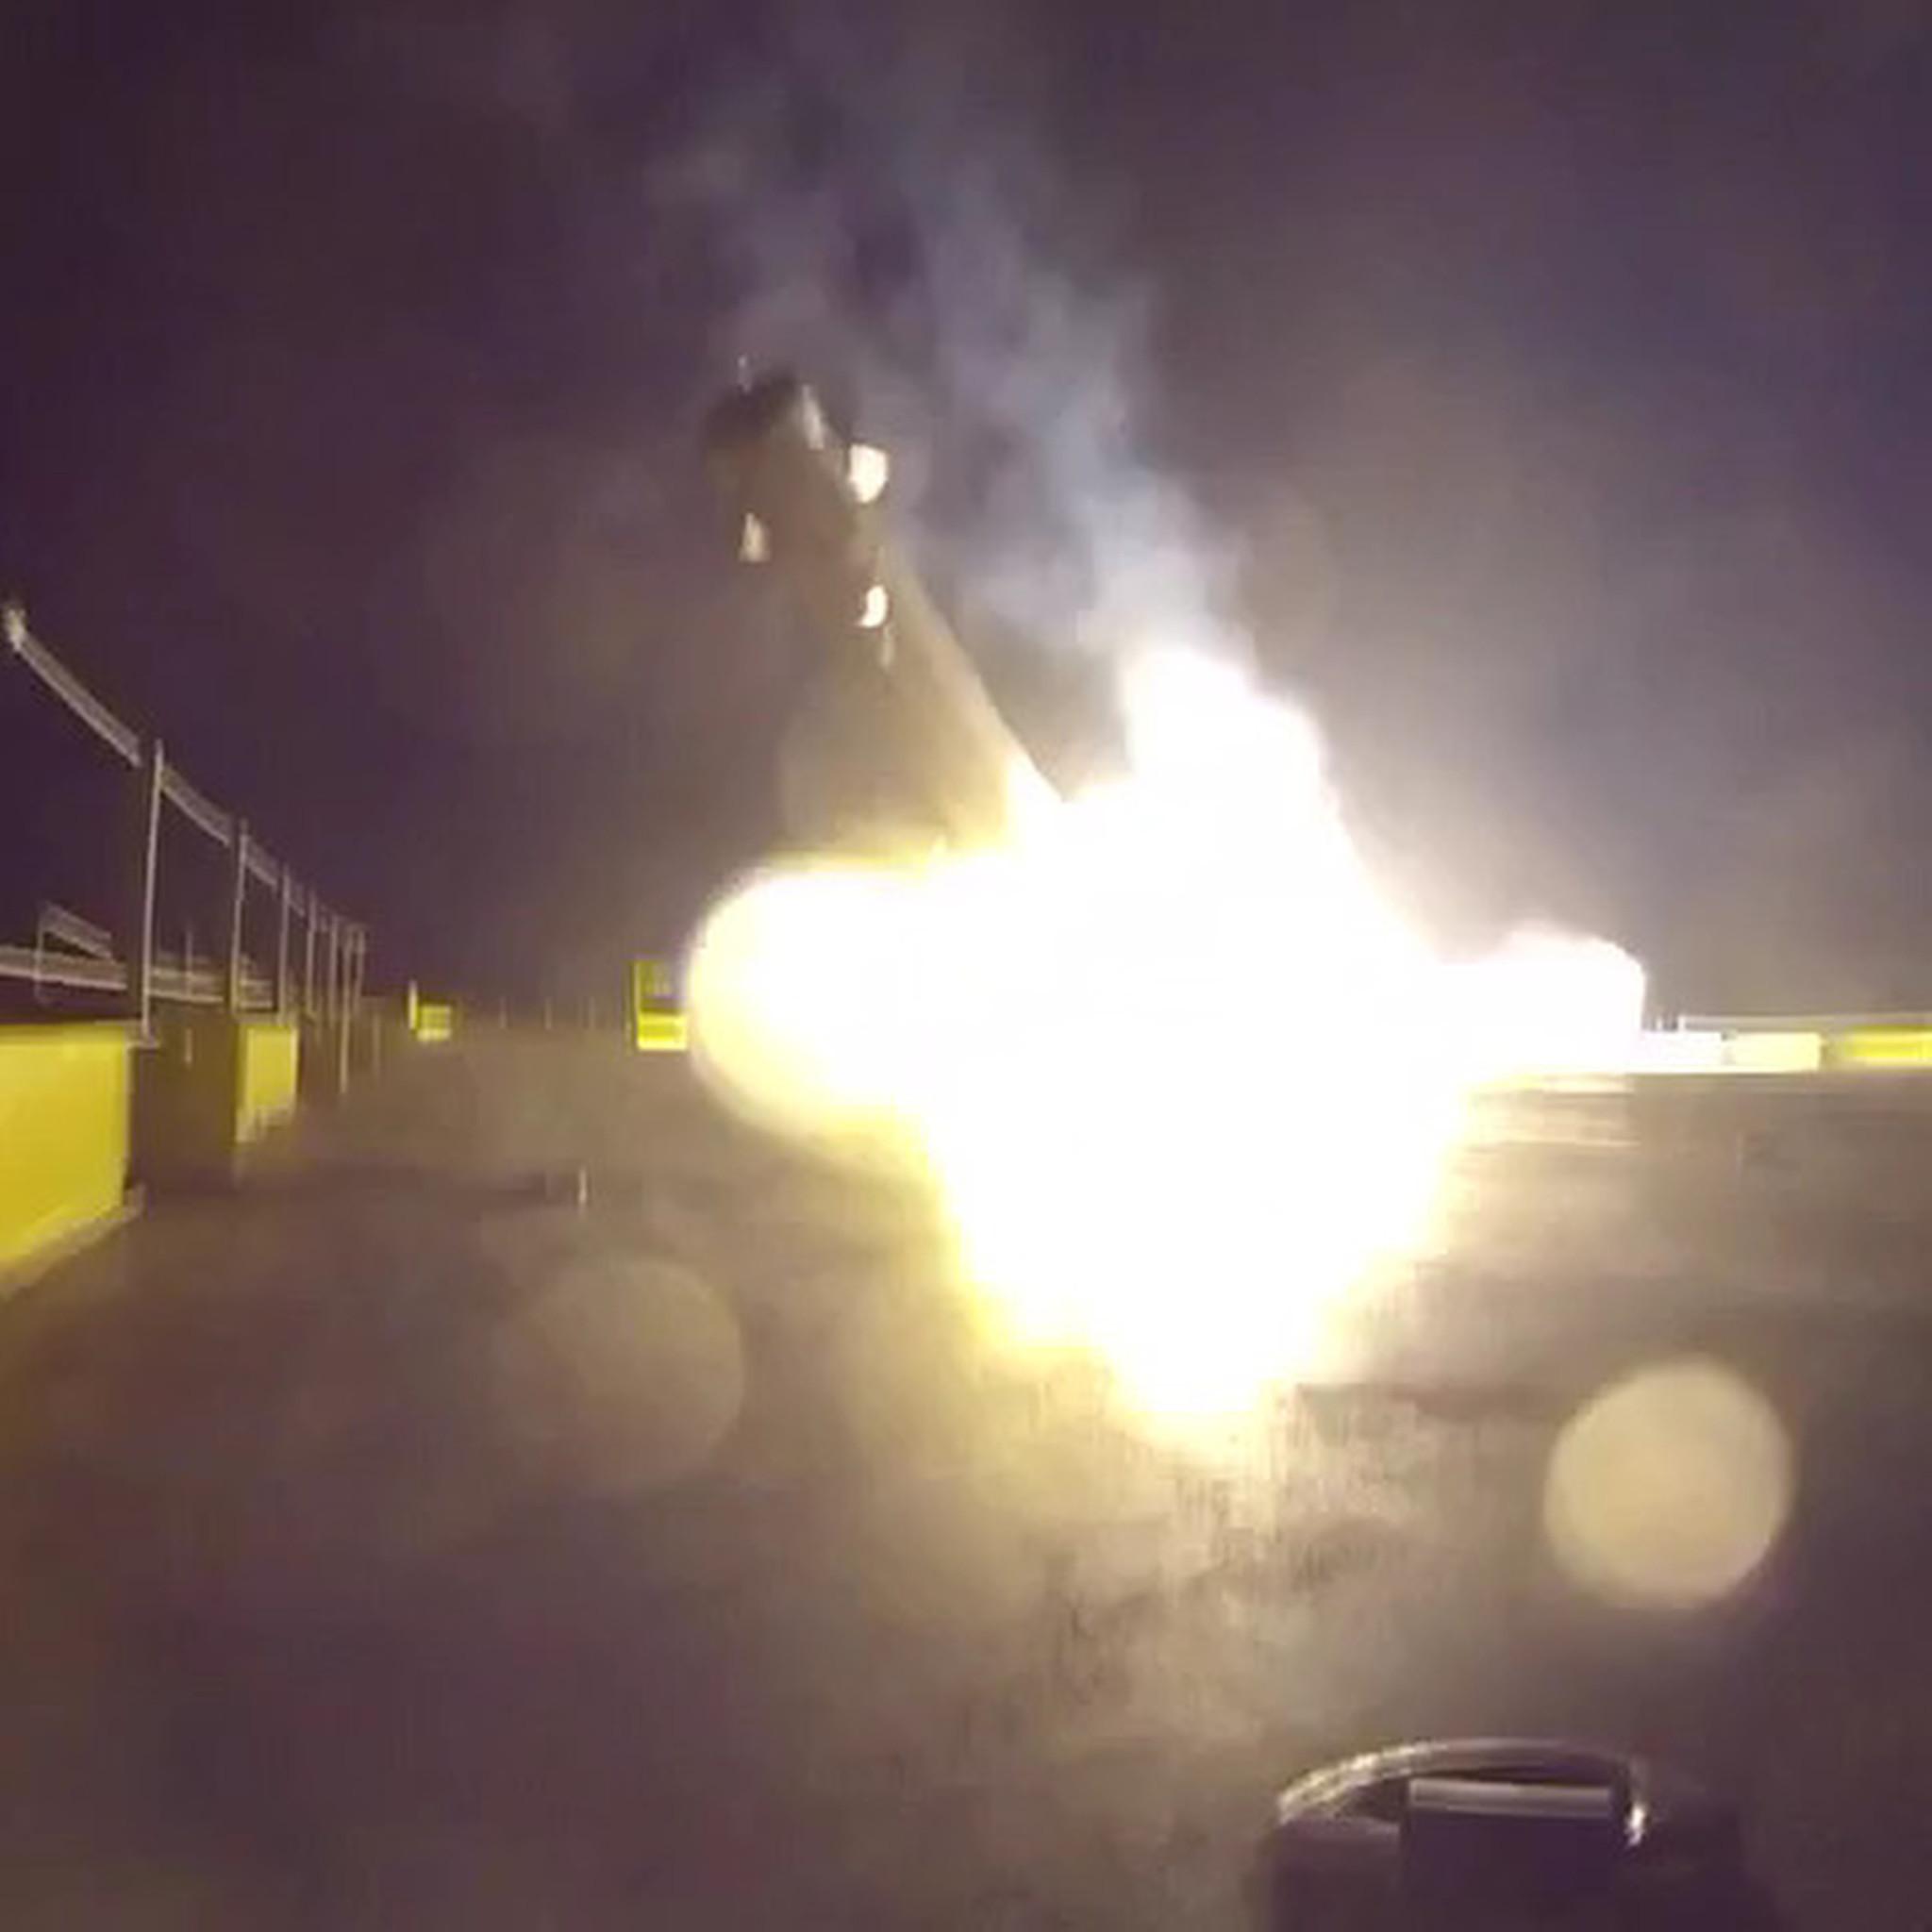 spacex releases video of rocket crash landing on ocean barge chicago tribune